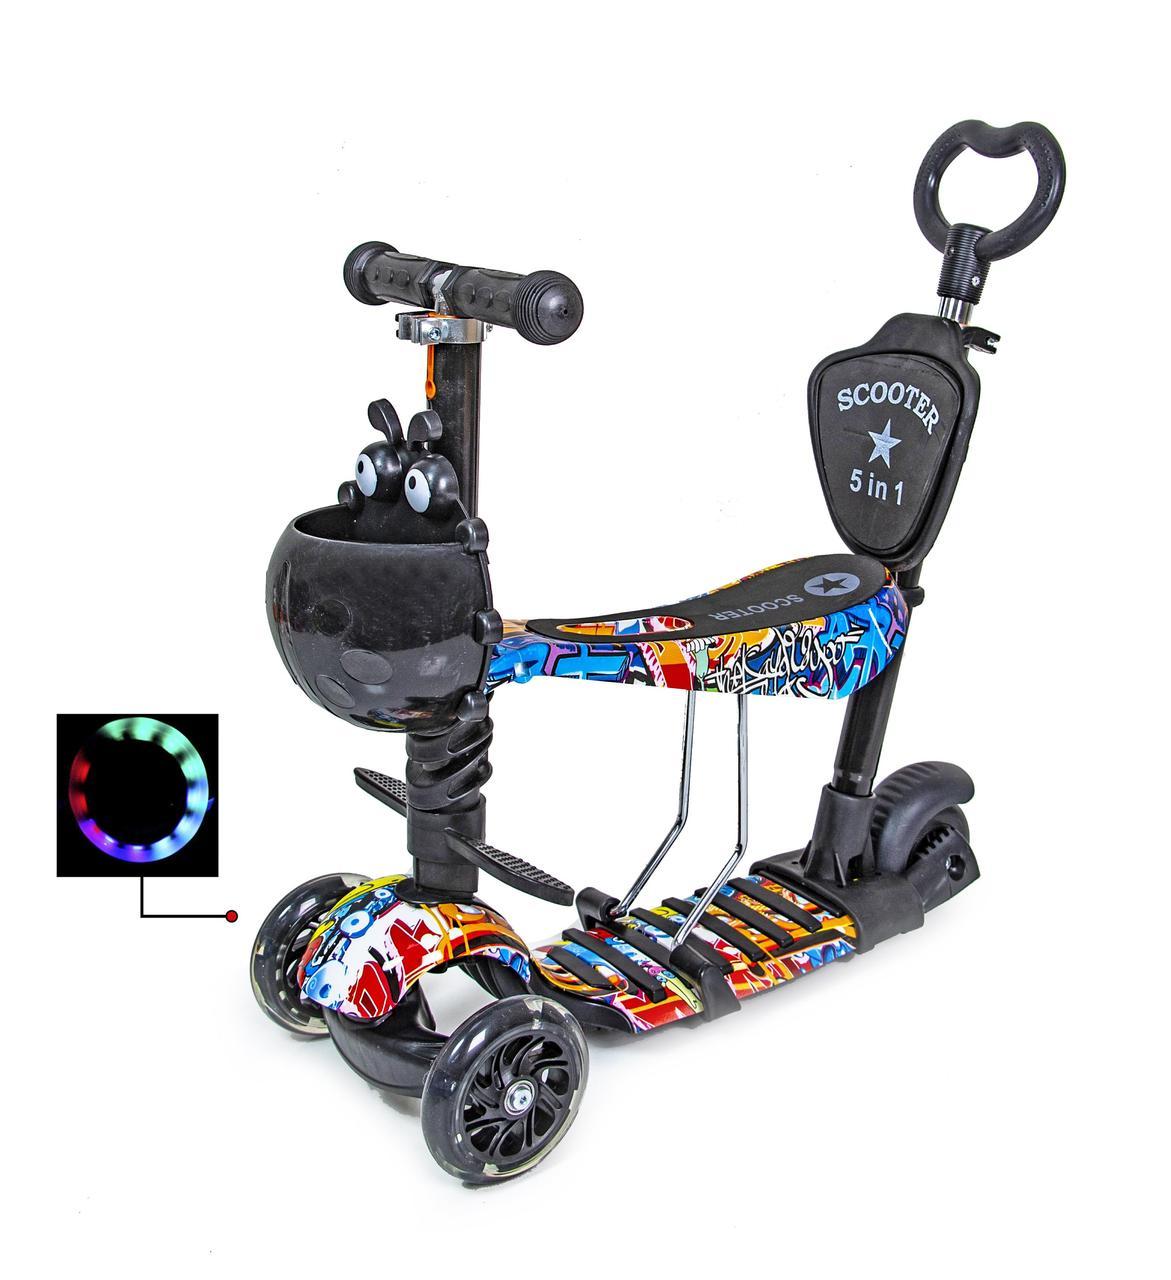 Самокат Scooter Graffiti 5in1 з малюнком оптом